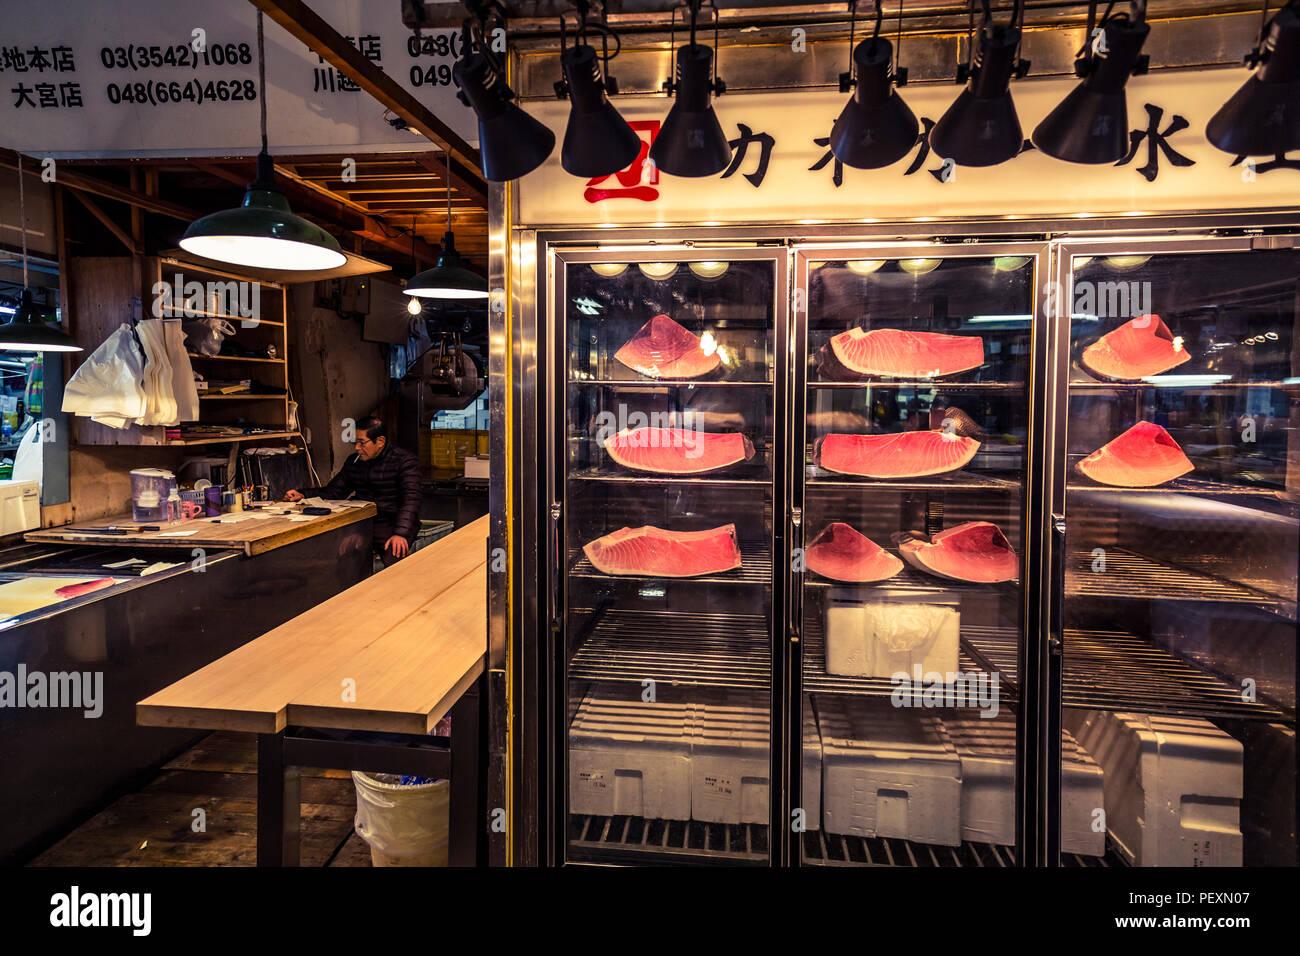 Tsukiji fish market in Tokyo, Japan - Stock Image